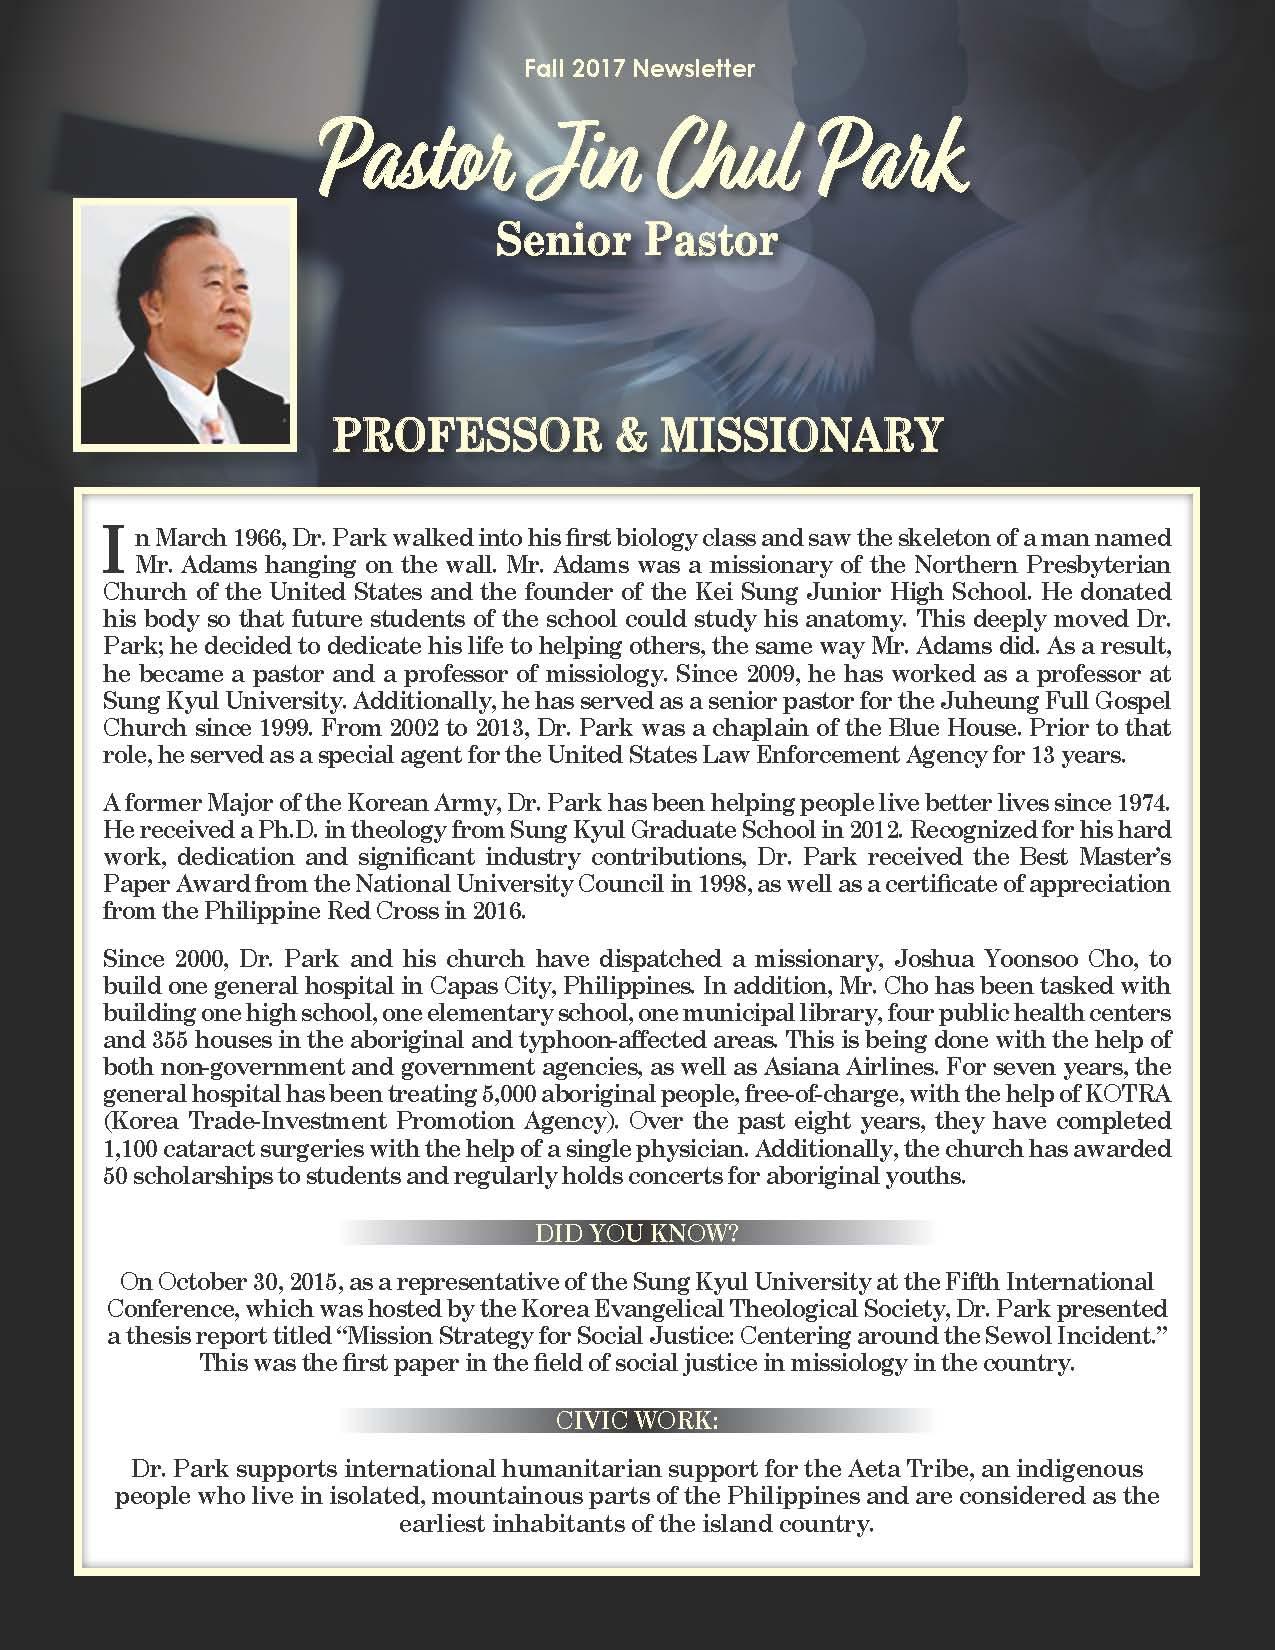 Park, Jin Chul 3620386_40004175 Newsletter.jpg